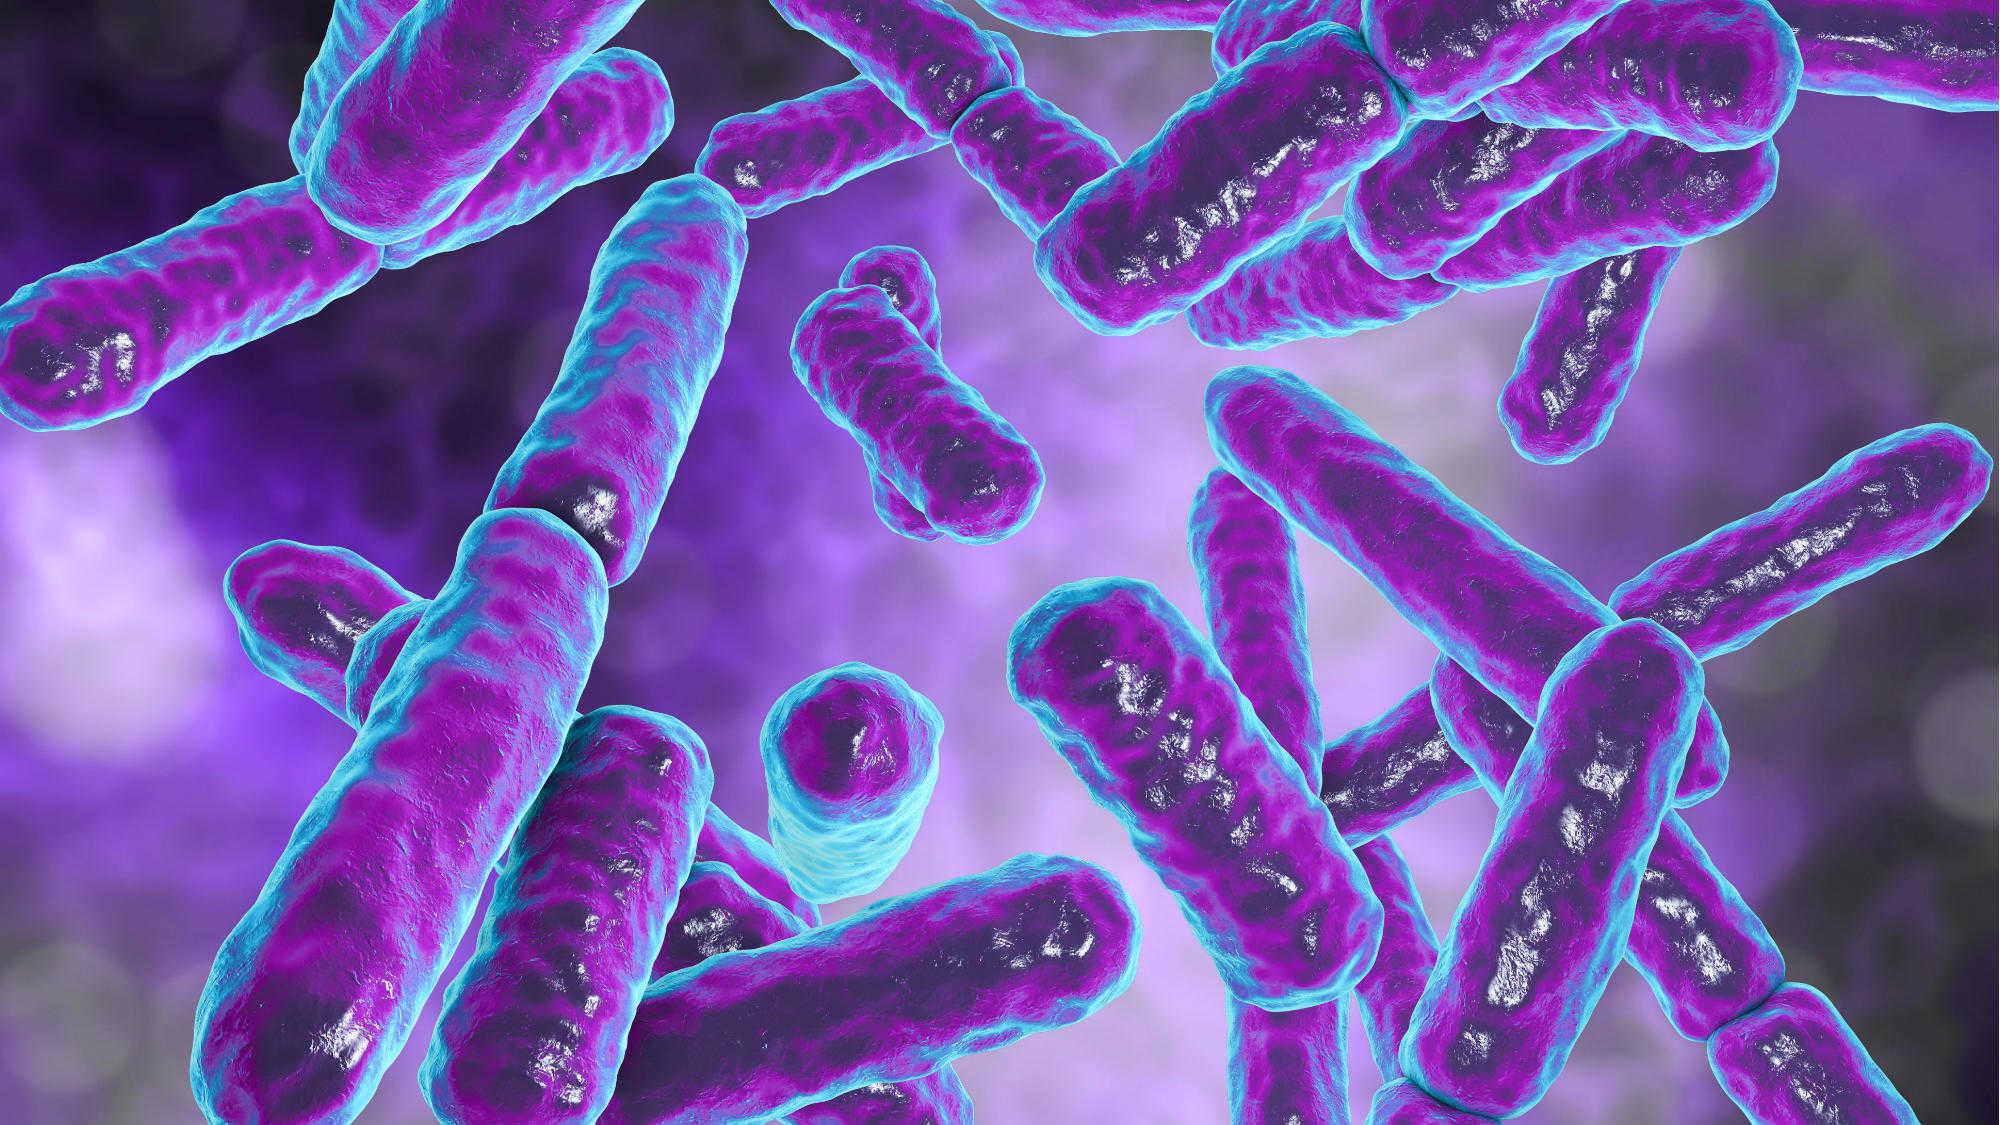 Microbioma-2000x1125-